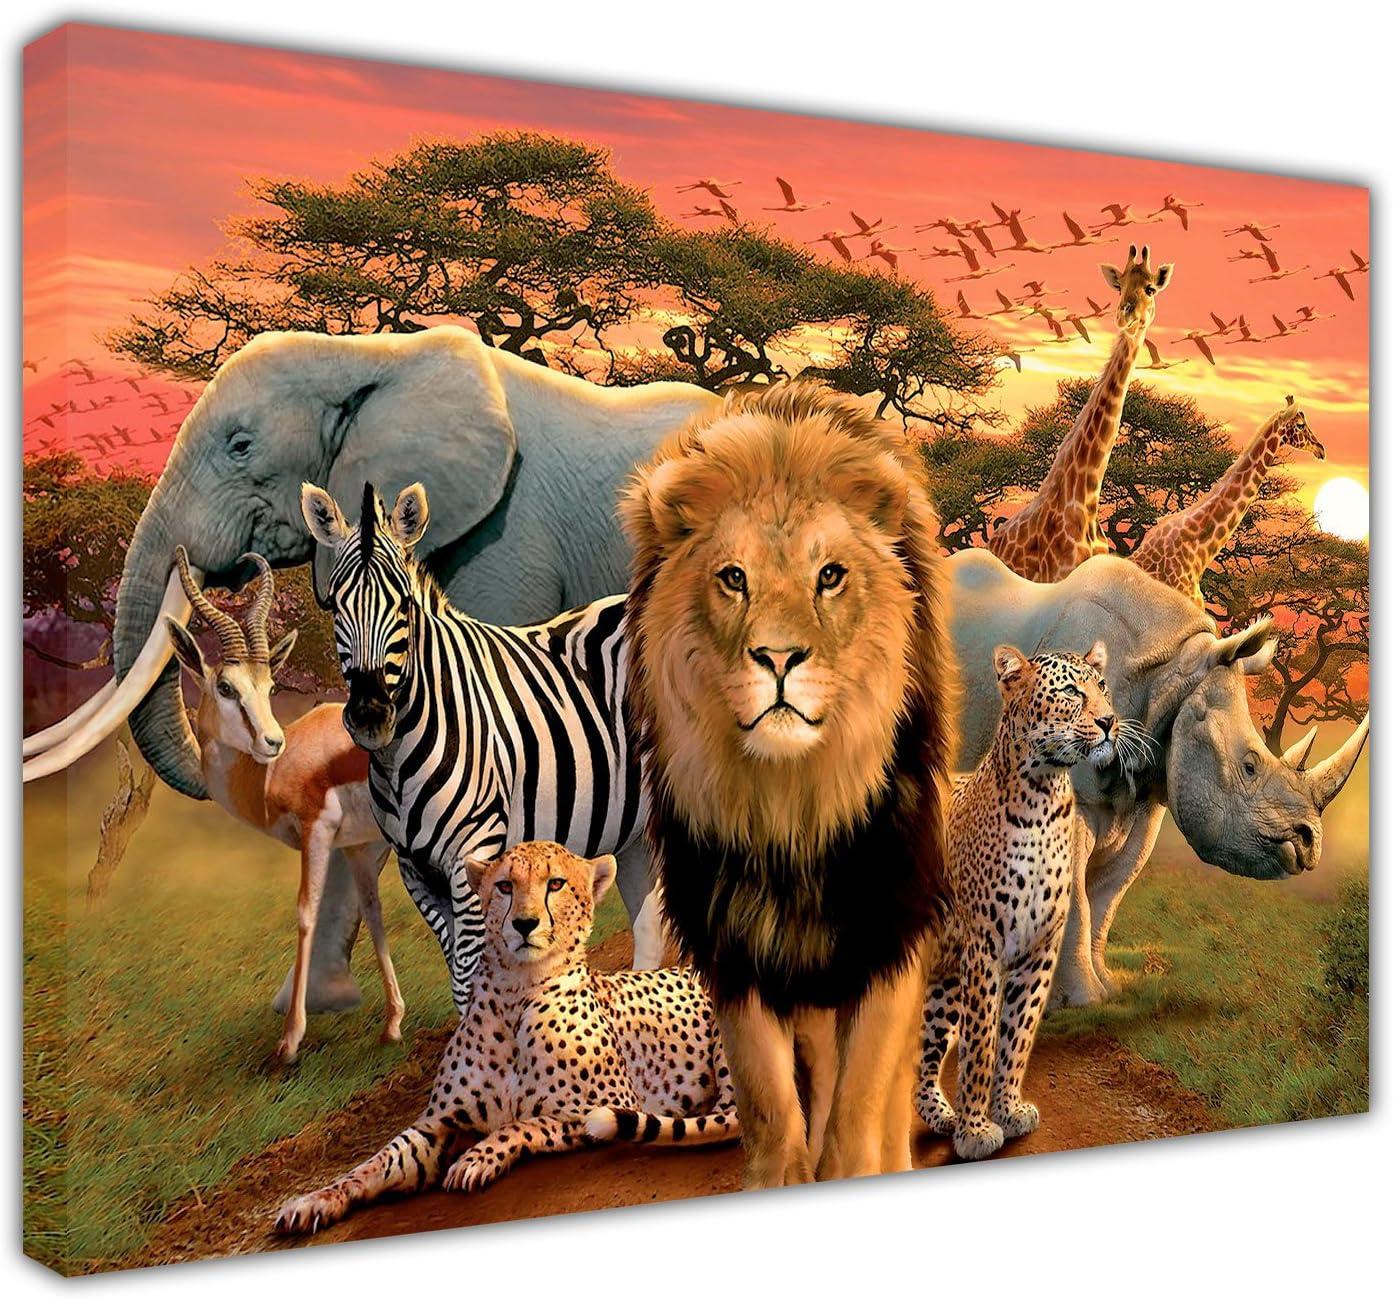 A4 Stunning Wildlife Poster Print White Lion A3